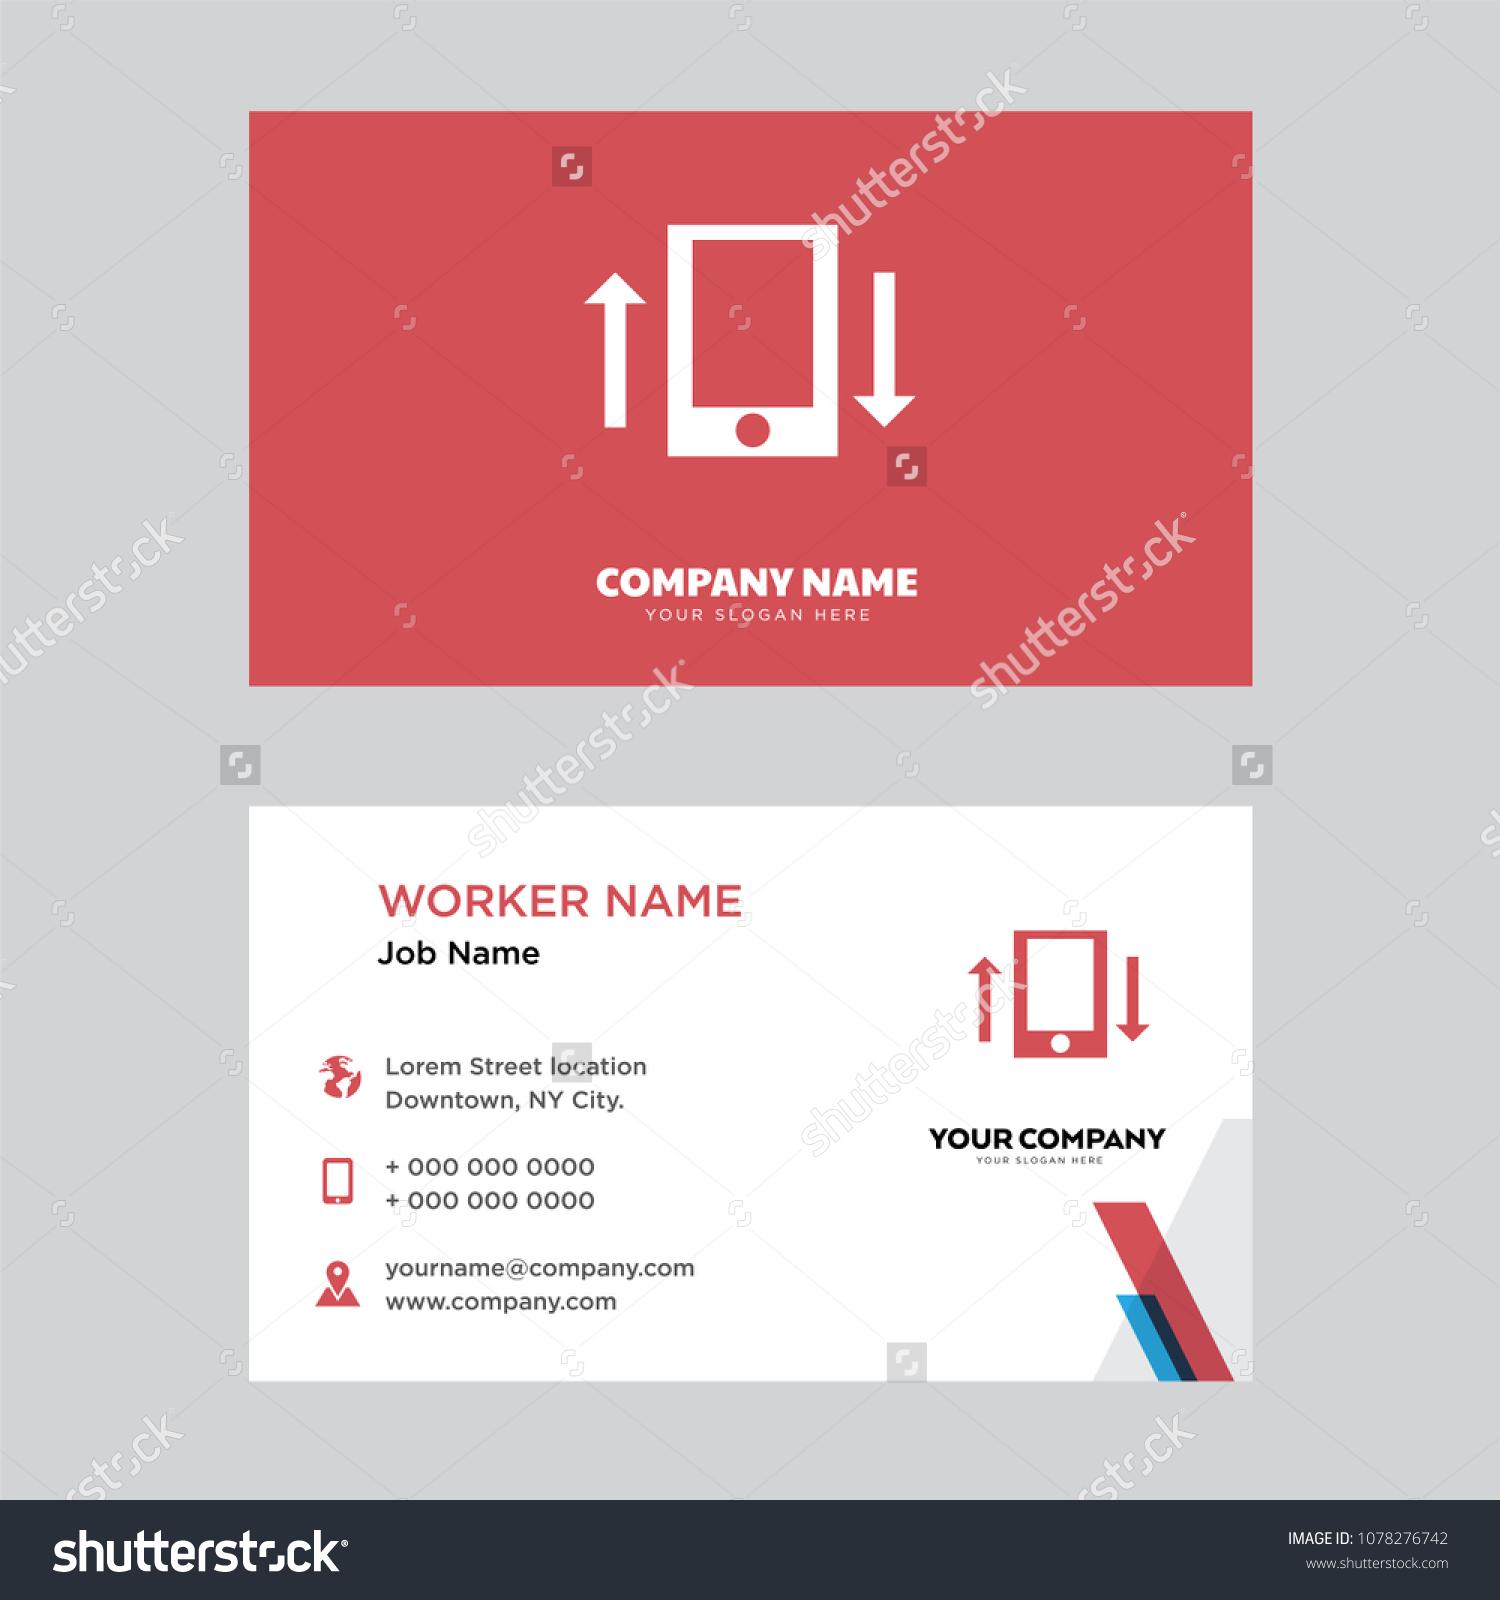 Sending Receiving Messages Business Card Design Stock Photo (Photo ...